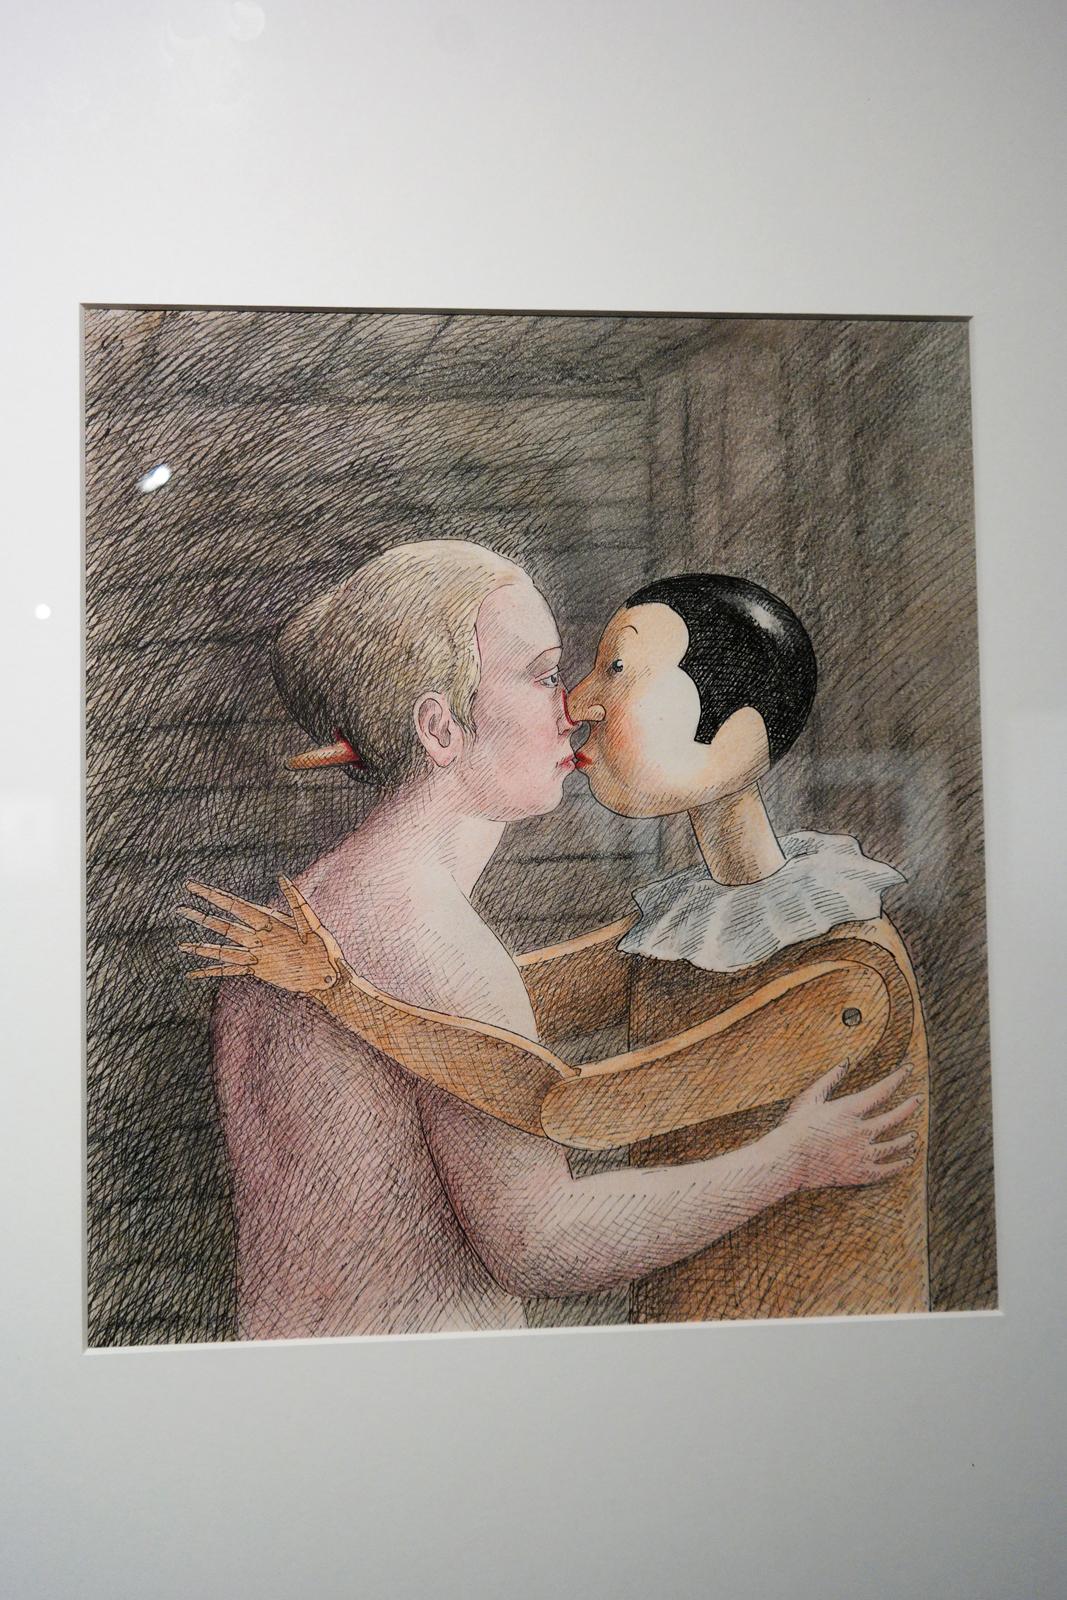 Pinocchio, 1975, Roland Topor, Collection Diogenes Verlag AG, Zurich